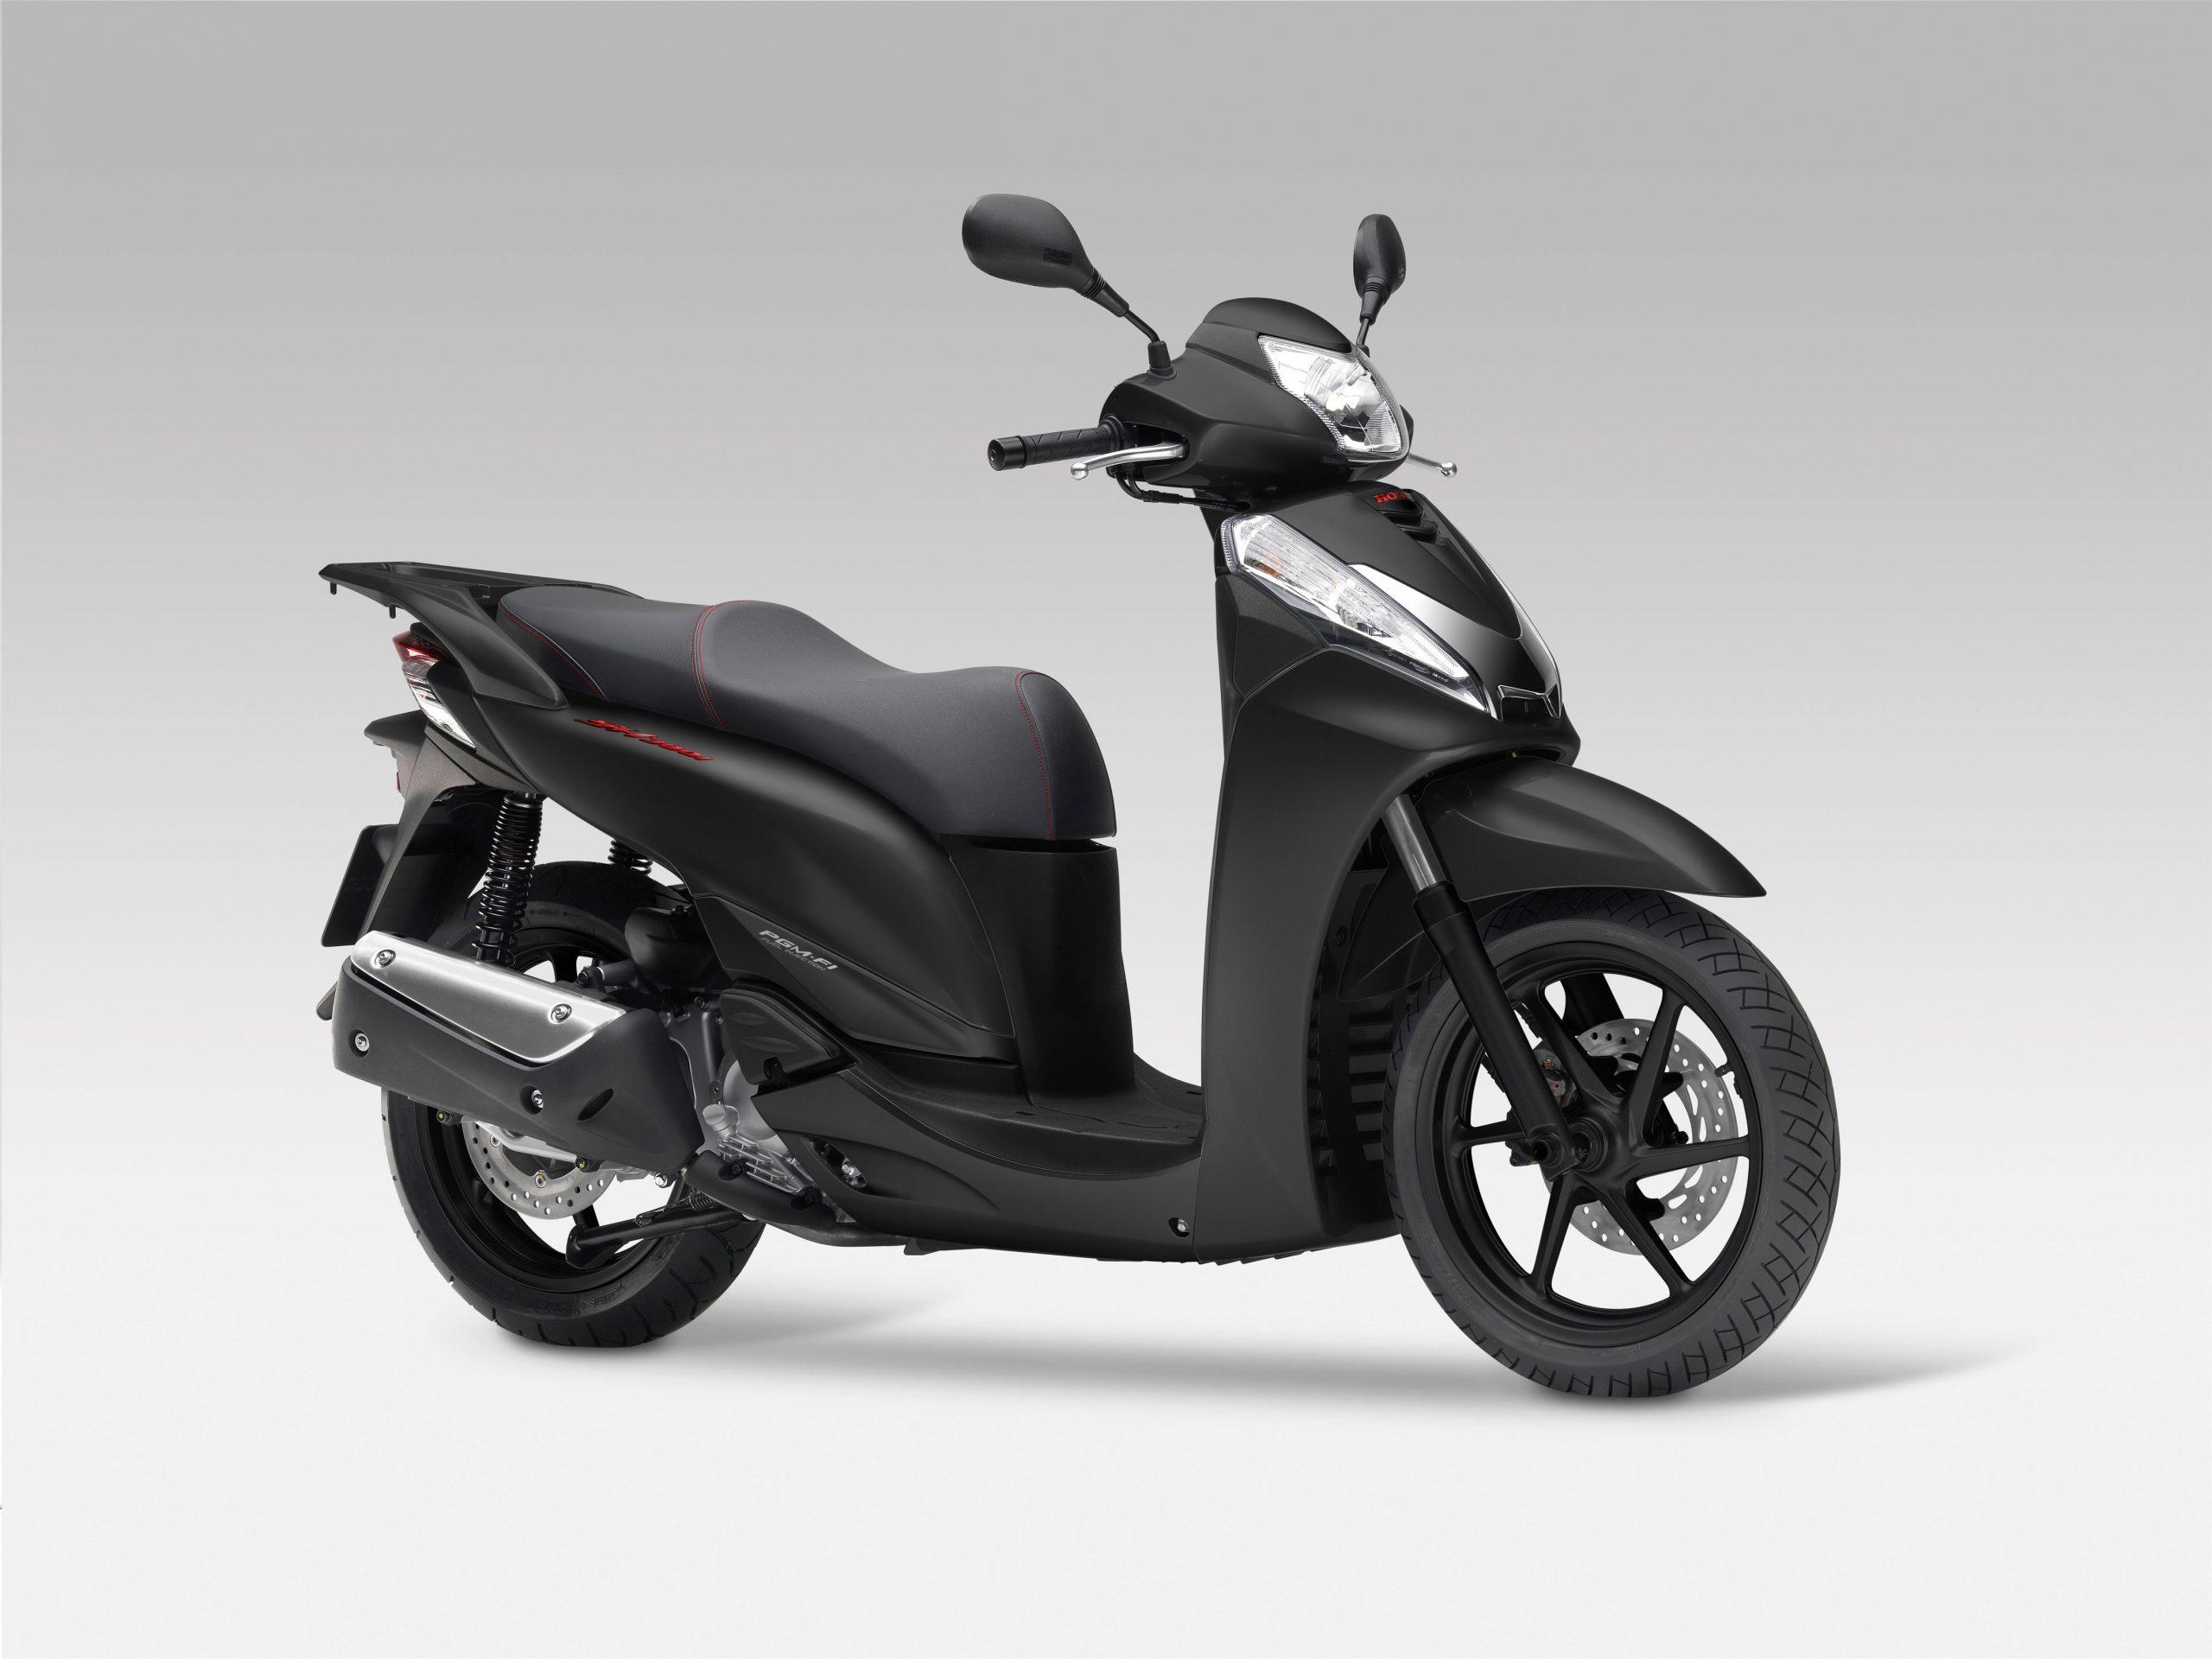 Motorbike types, scooter, Honda SH300i